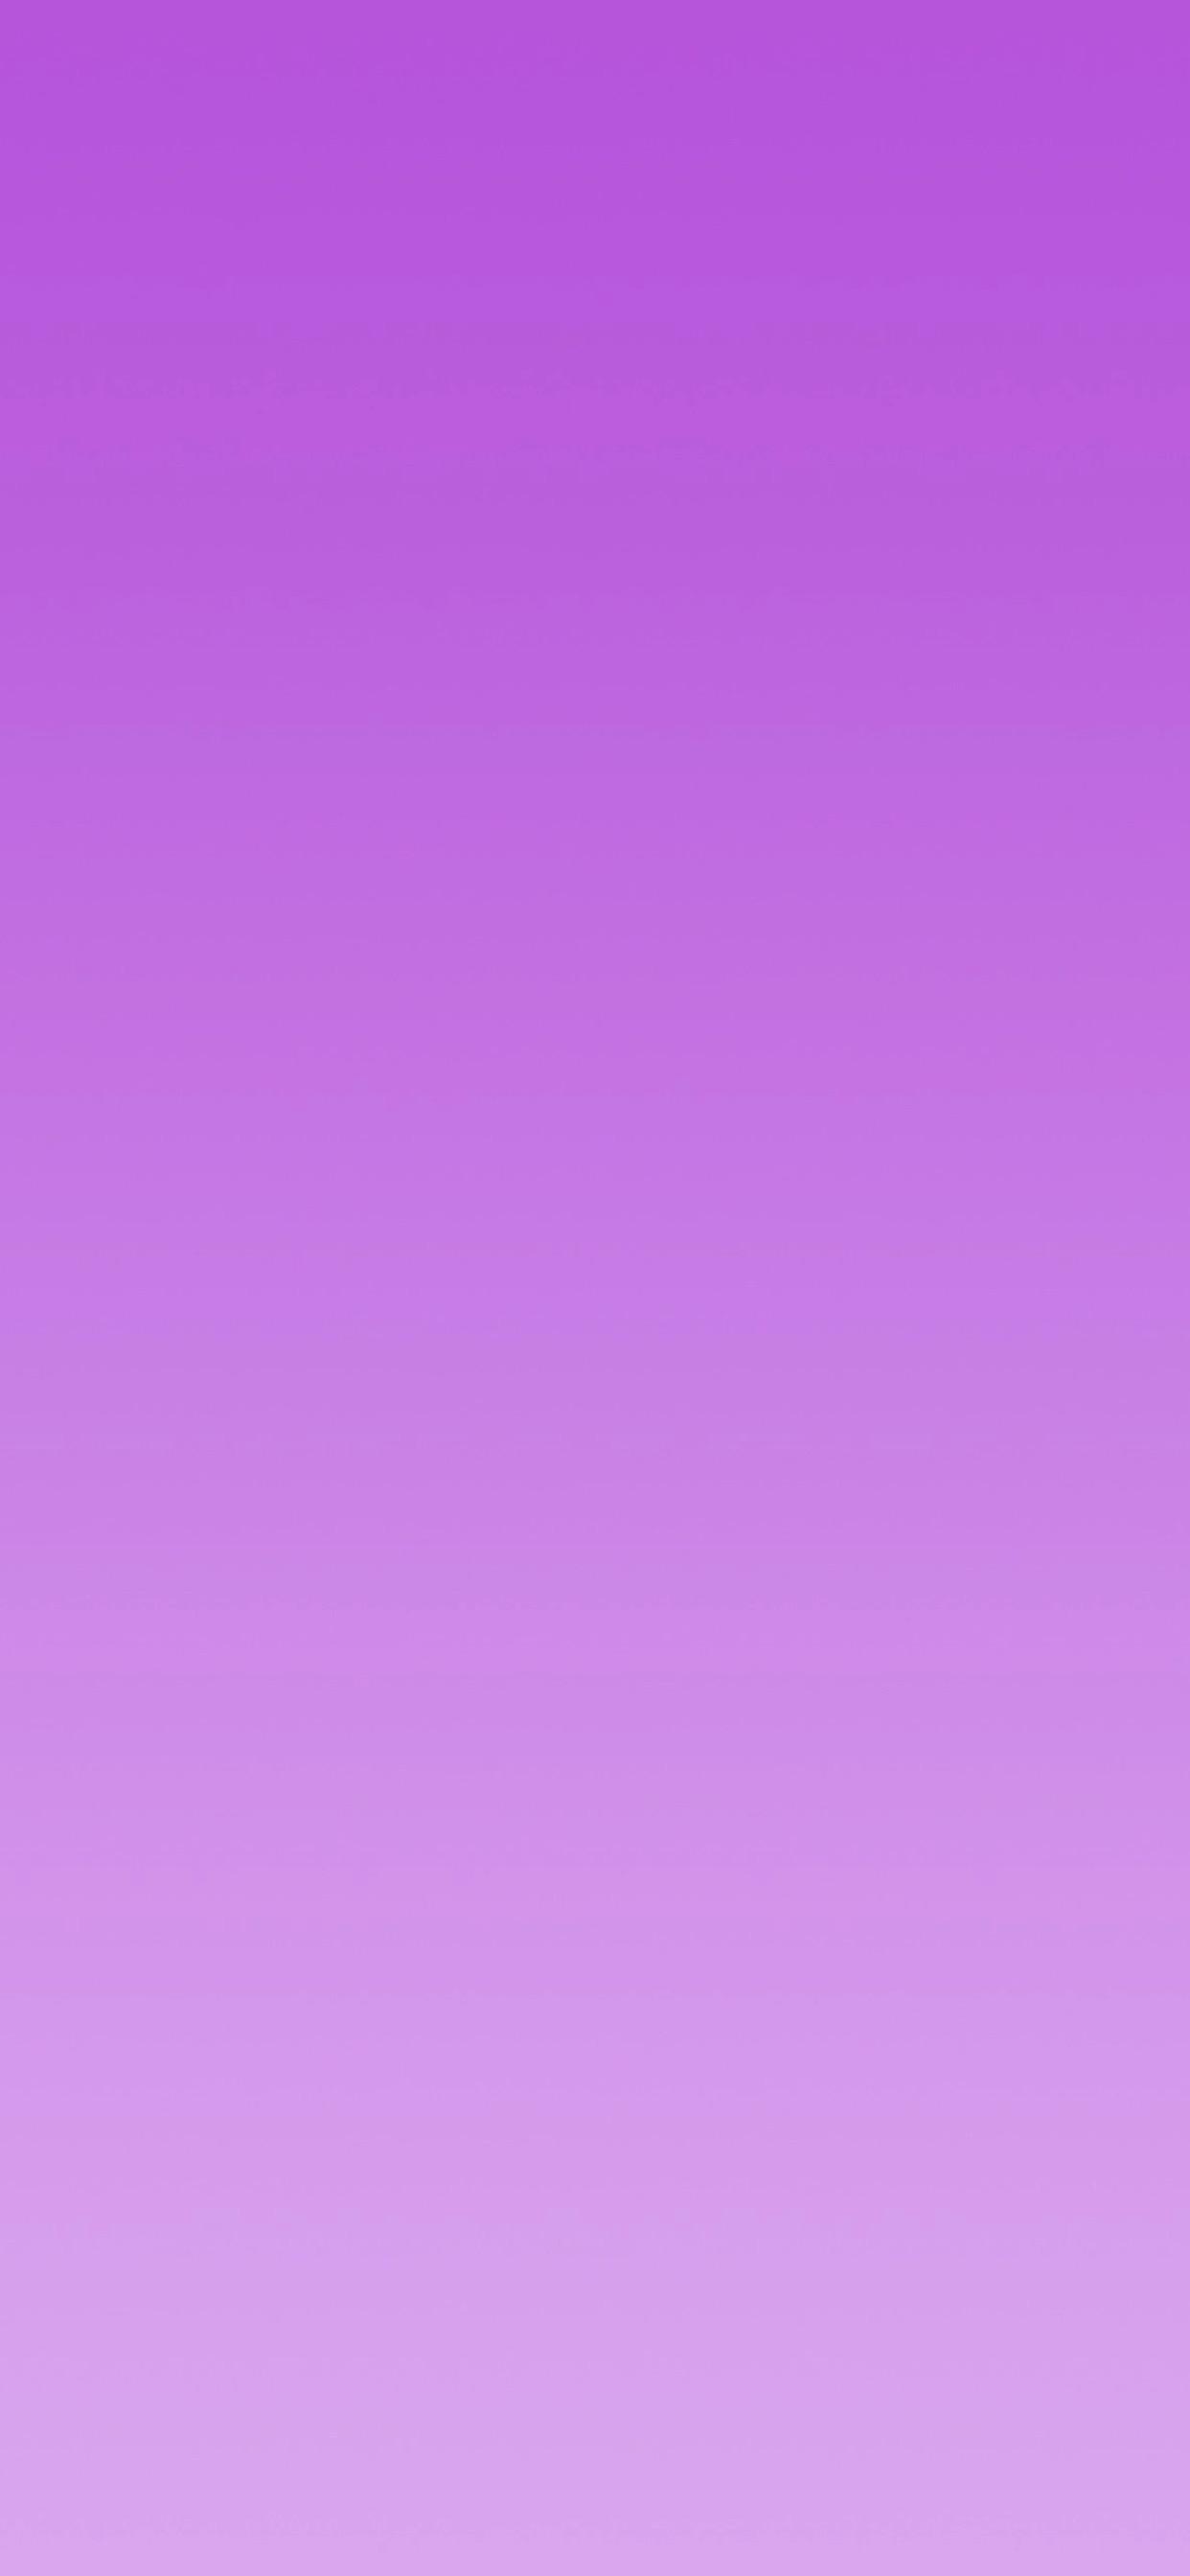 iPhone XS Max 壁紙 0437